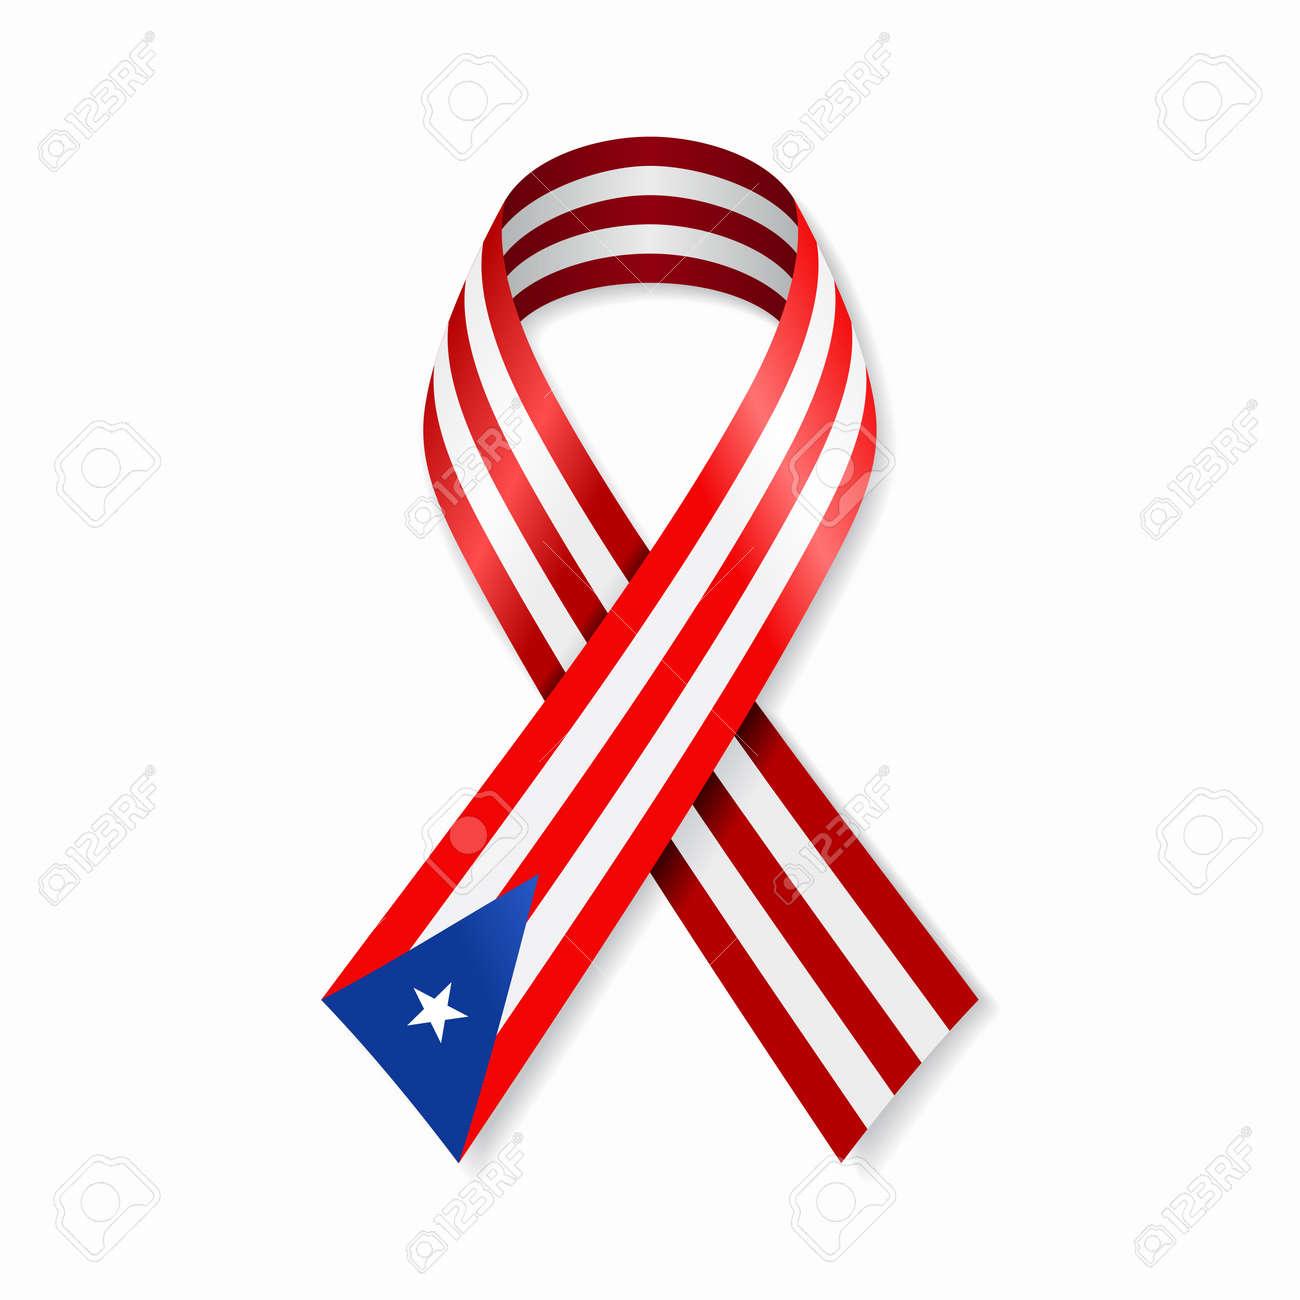 Puerto Rican flag stripe ribbon on white background. Vector illustration. - 151645505